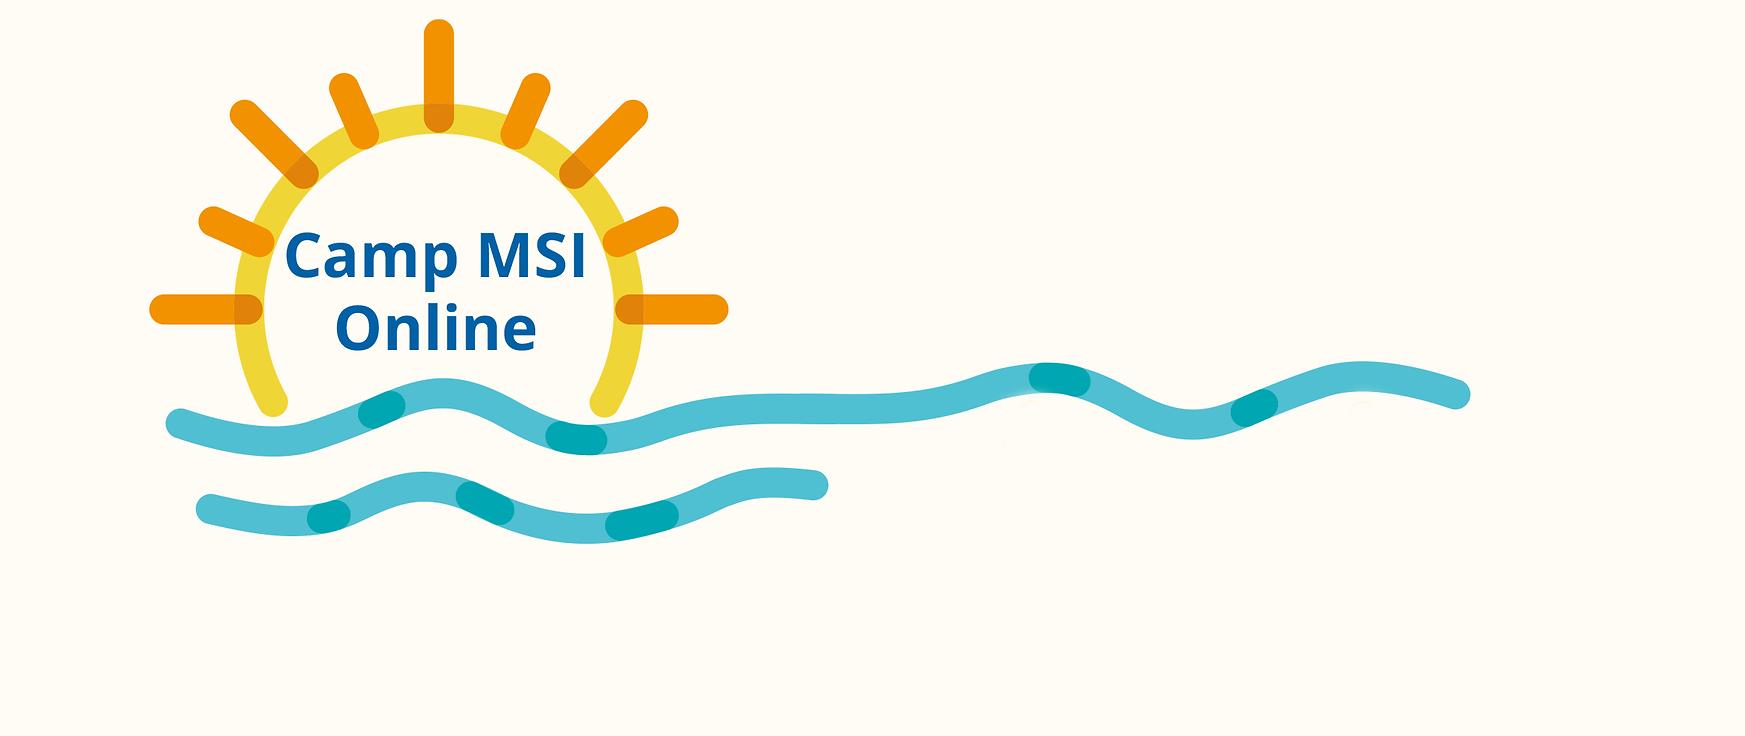 Camp MSI Online Logo